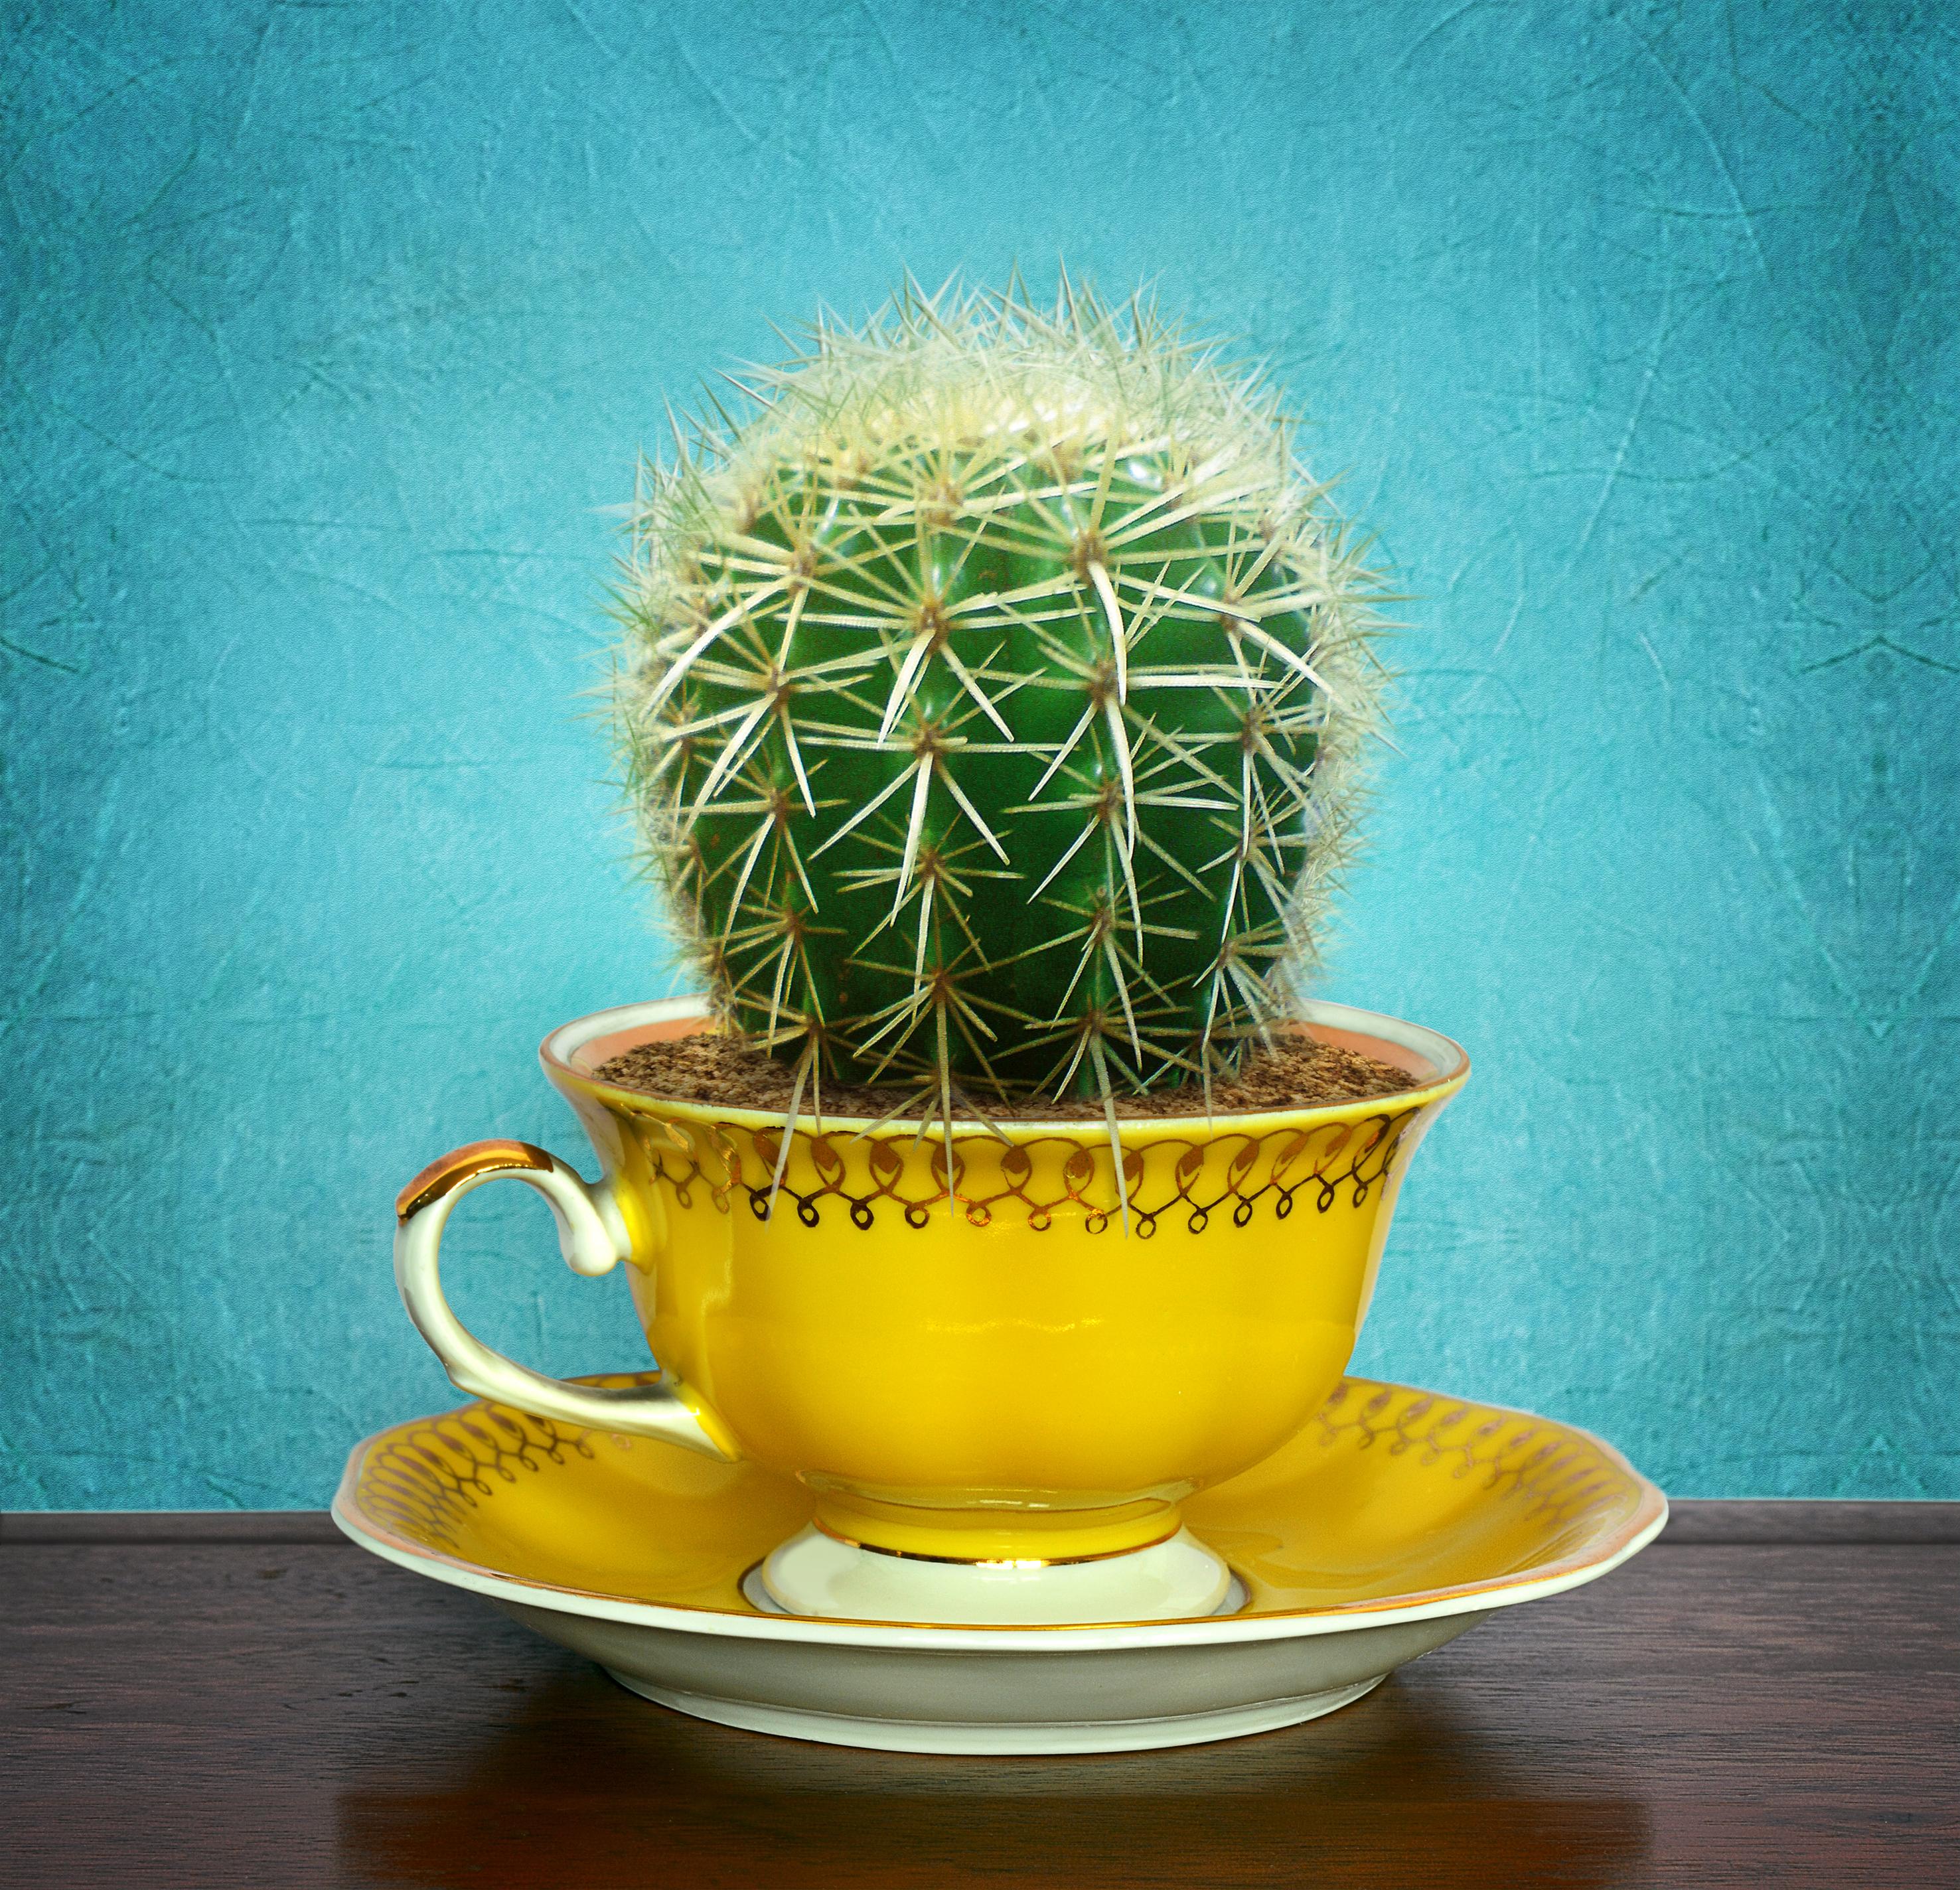 Cactus in cup